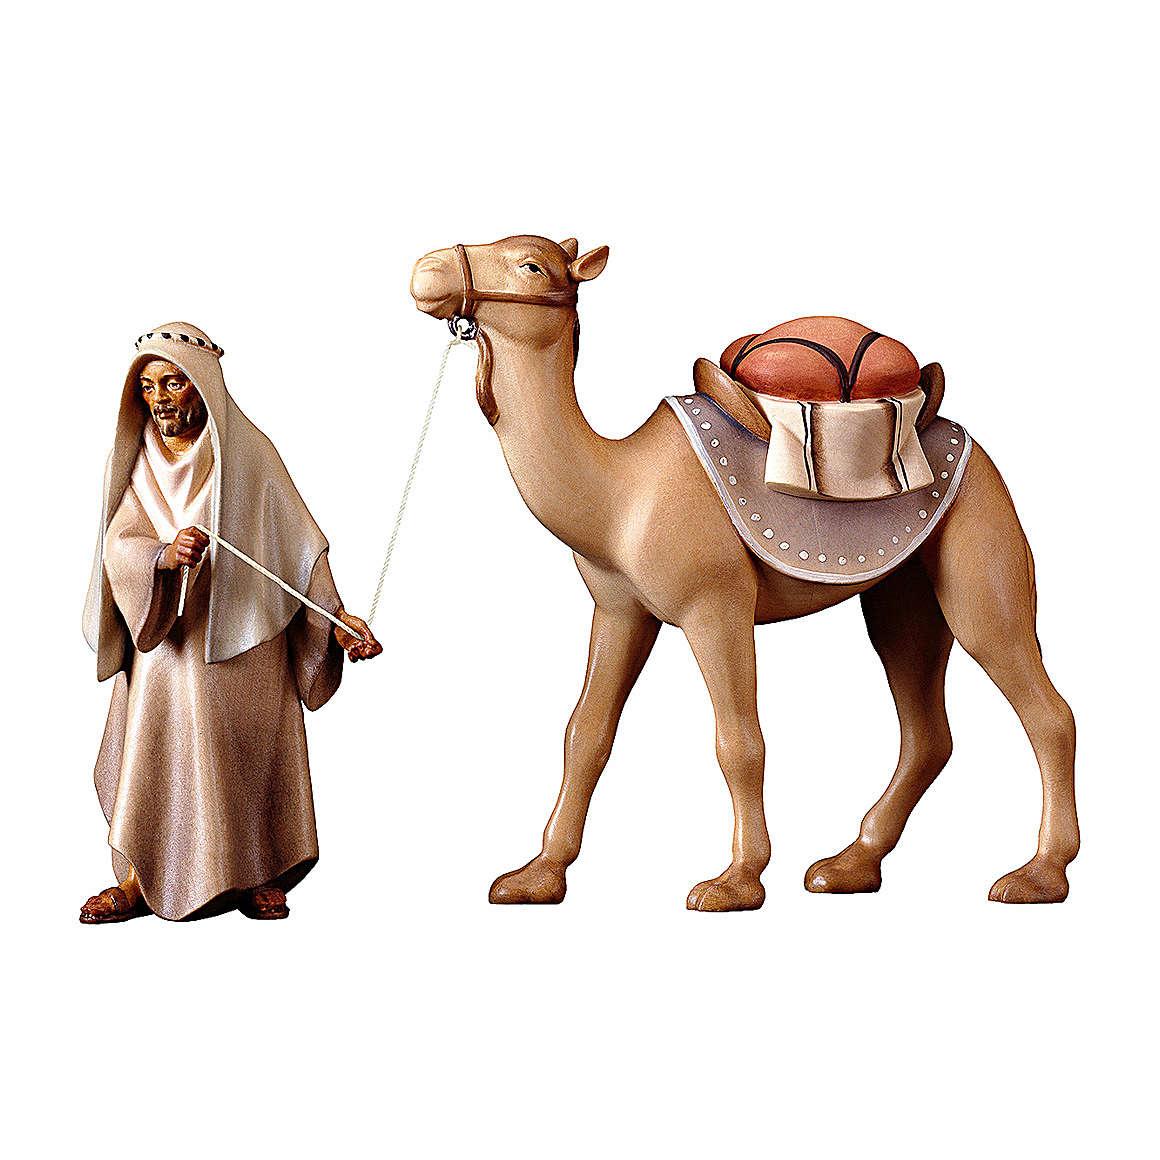 Cammelliere adulto cammello in piedi presepe Original Redentore legno dipinto in Valgardena 12 cm 4